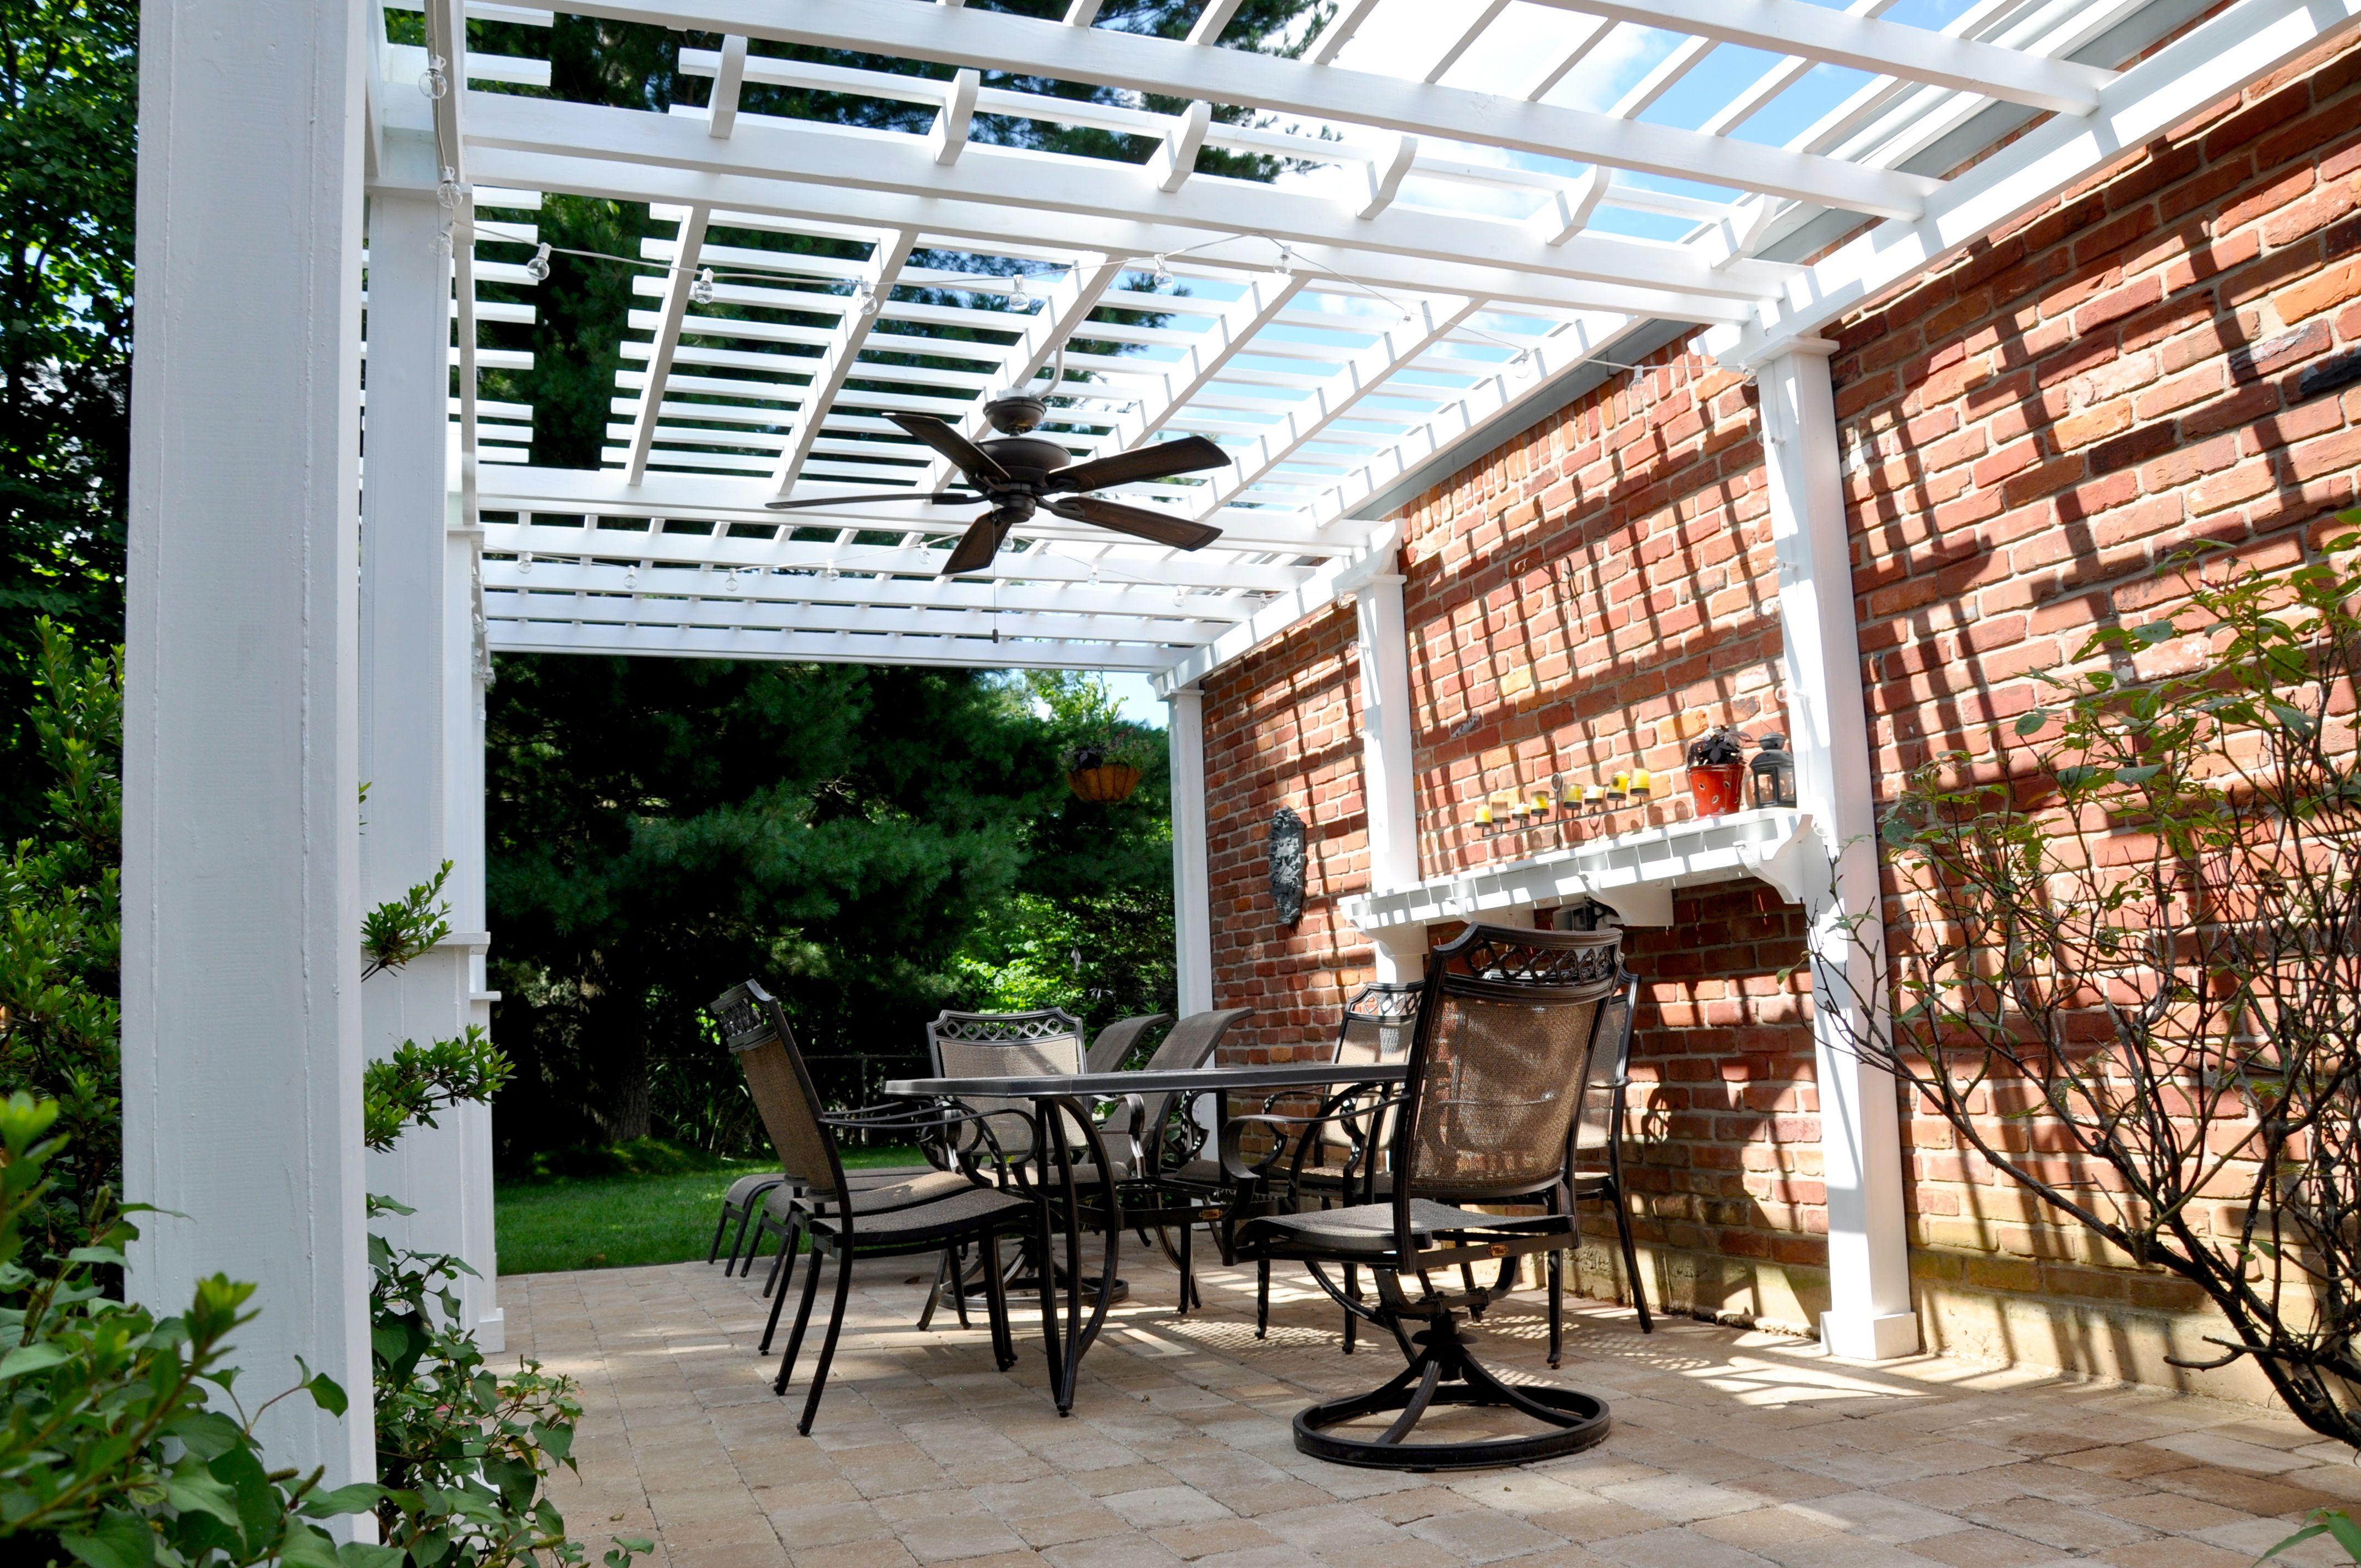 quorum ceiling pin patio fan estate patios light outdoor black in matte fans for